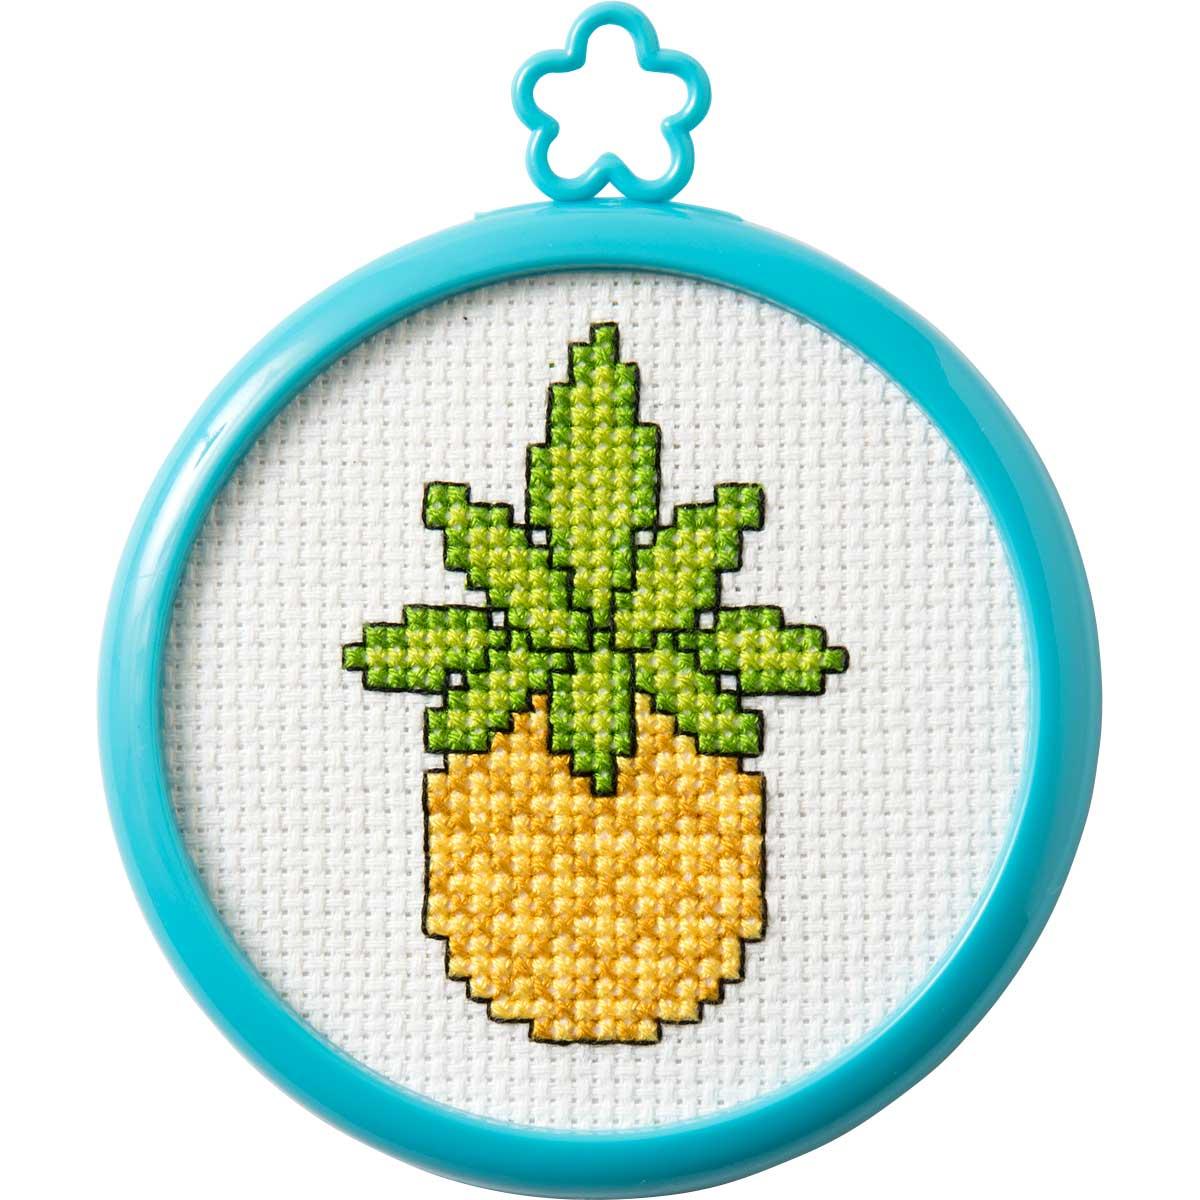 Bucilla ® My 1st Stitch™ - Counted Cross Stitch Kits - Mini - Tropical Pineapple